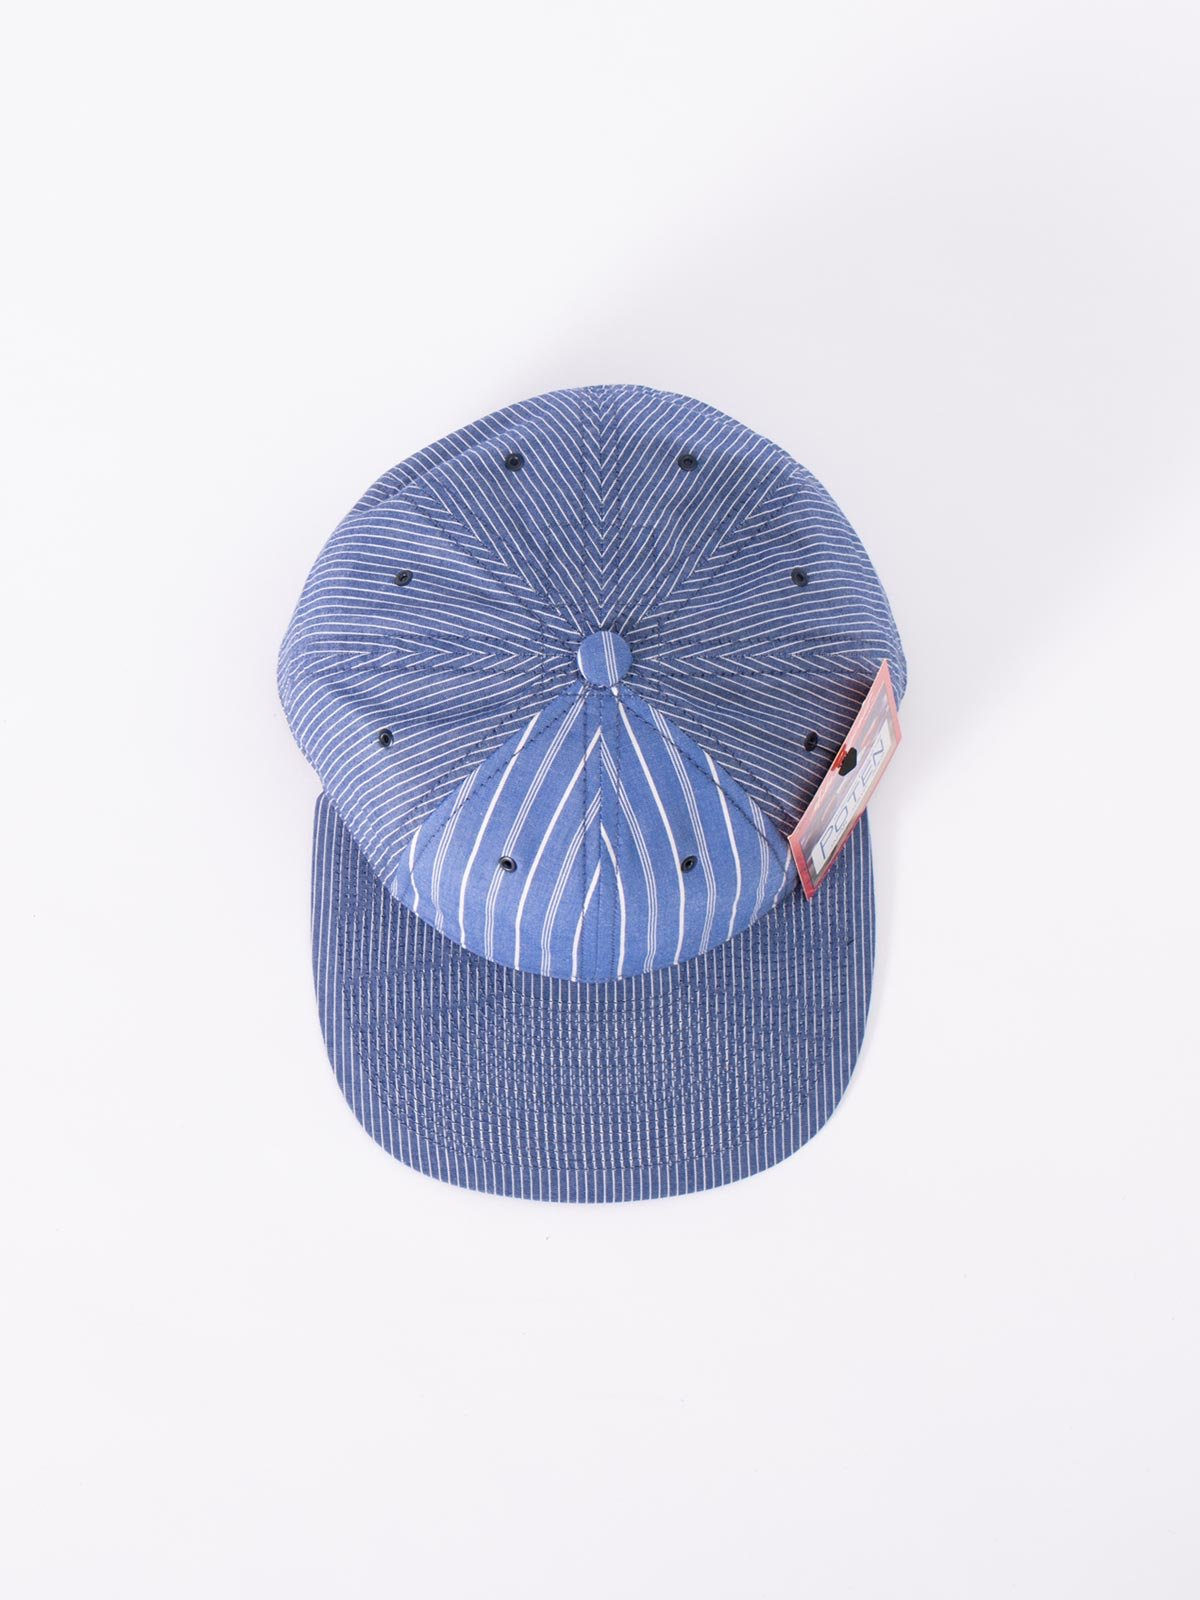 BLUE JAPANESE CHAMBRAY CAP - Image 3